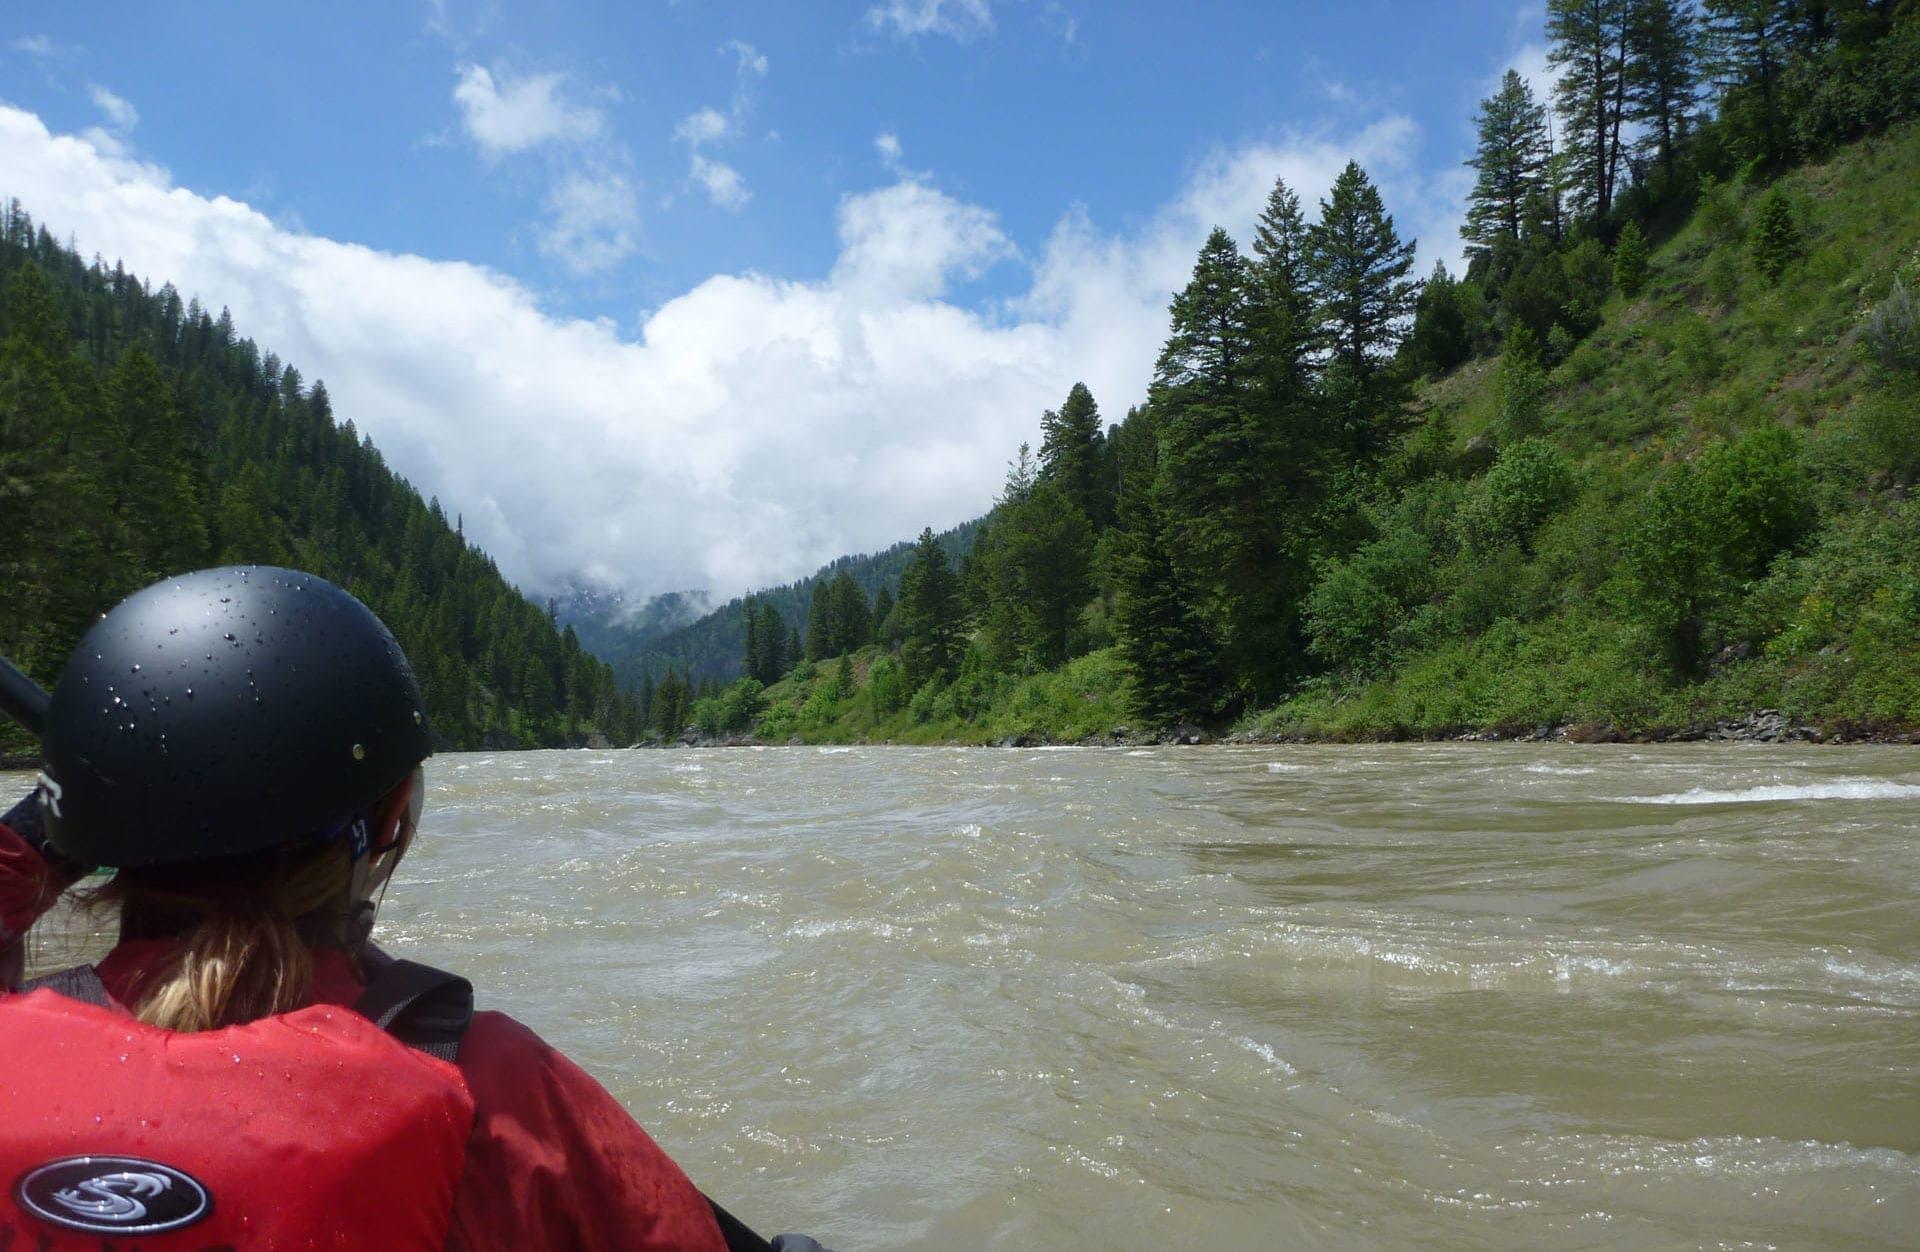 Kayaking the Snake River near Jackson Hole